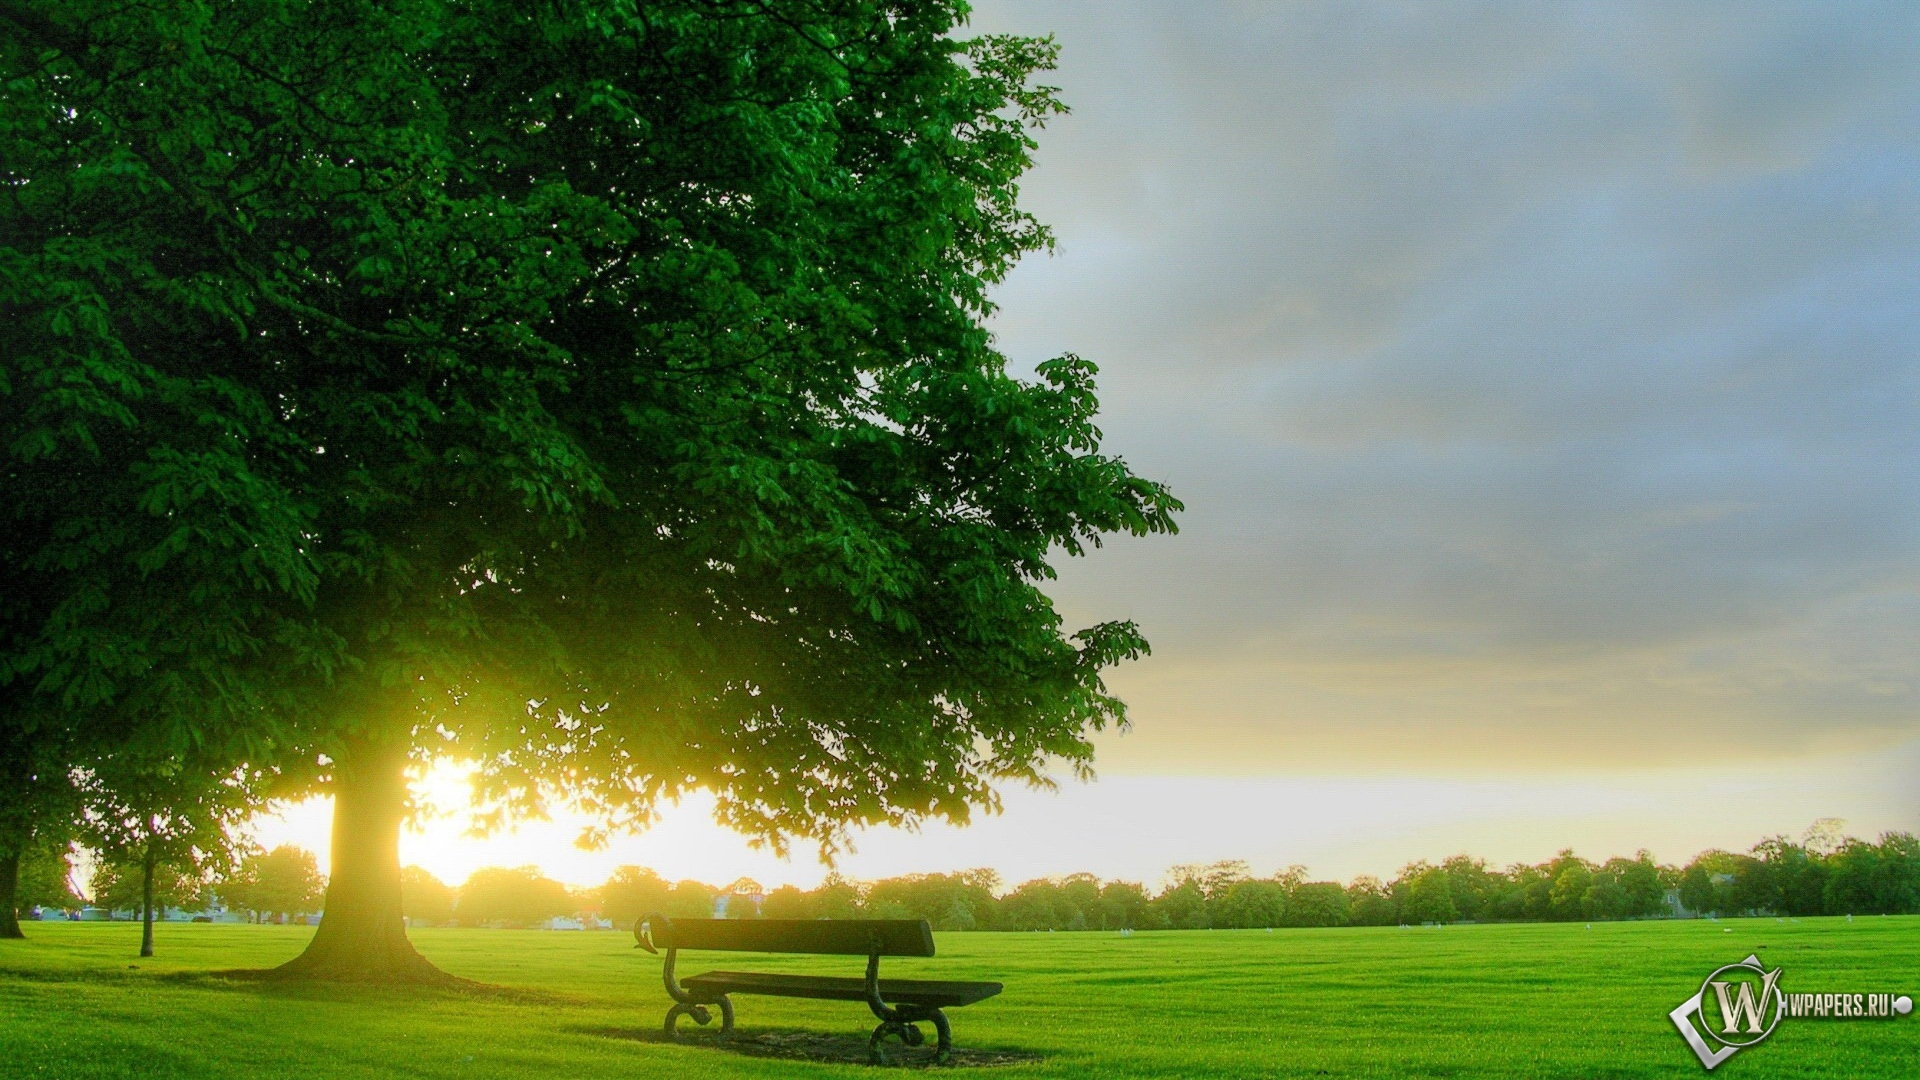 Дерево и скамейка 1920x1080